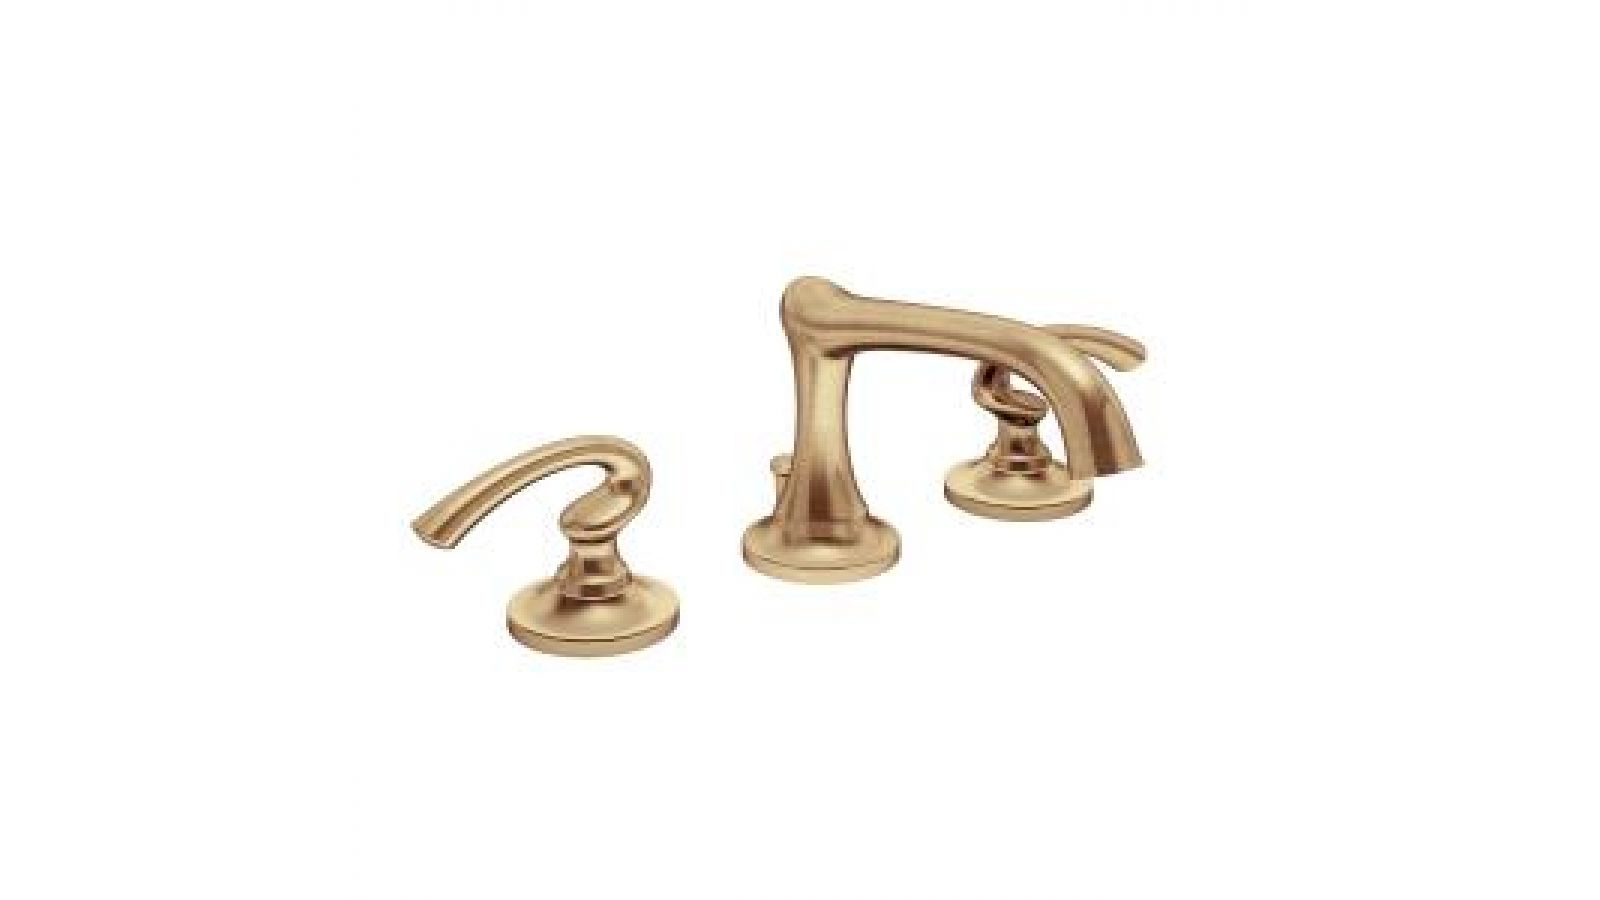 Ballina Bath Faucet in Brushed Bronze